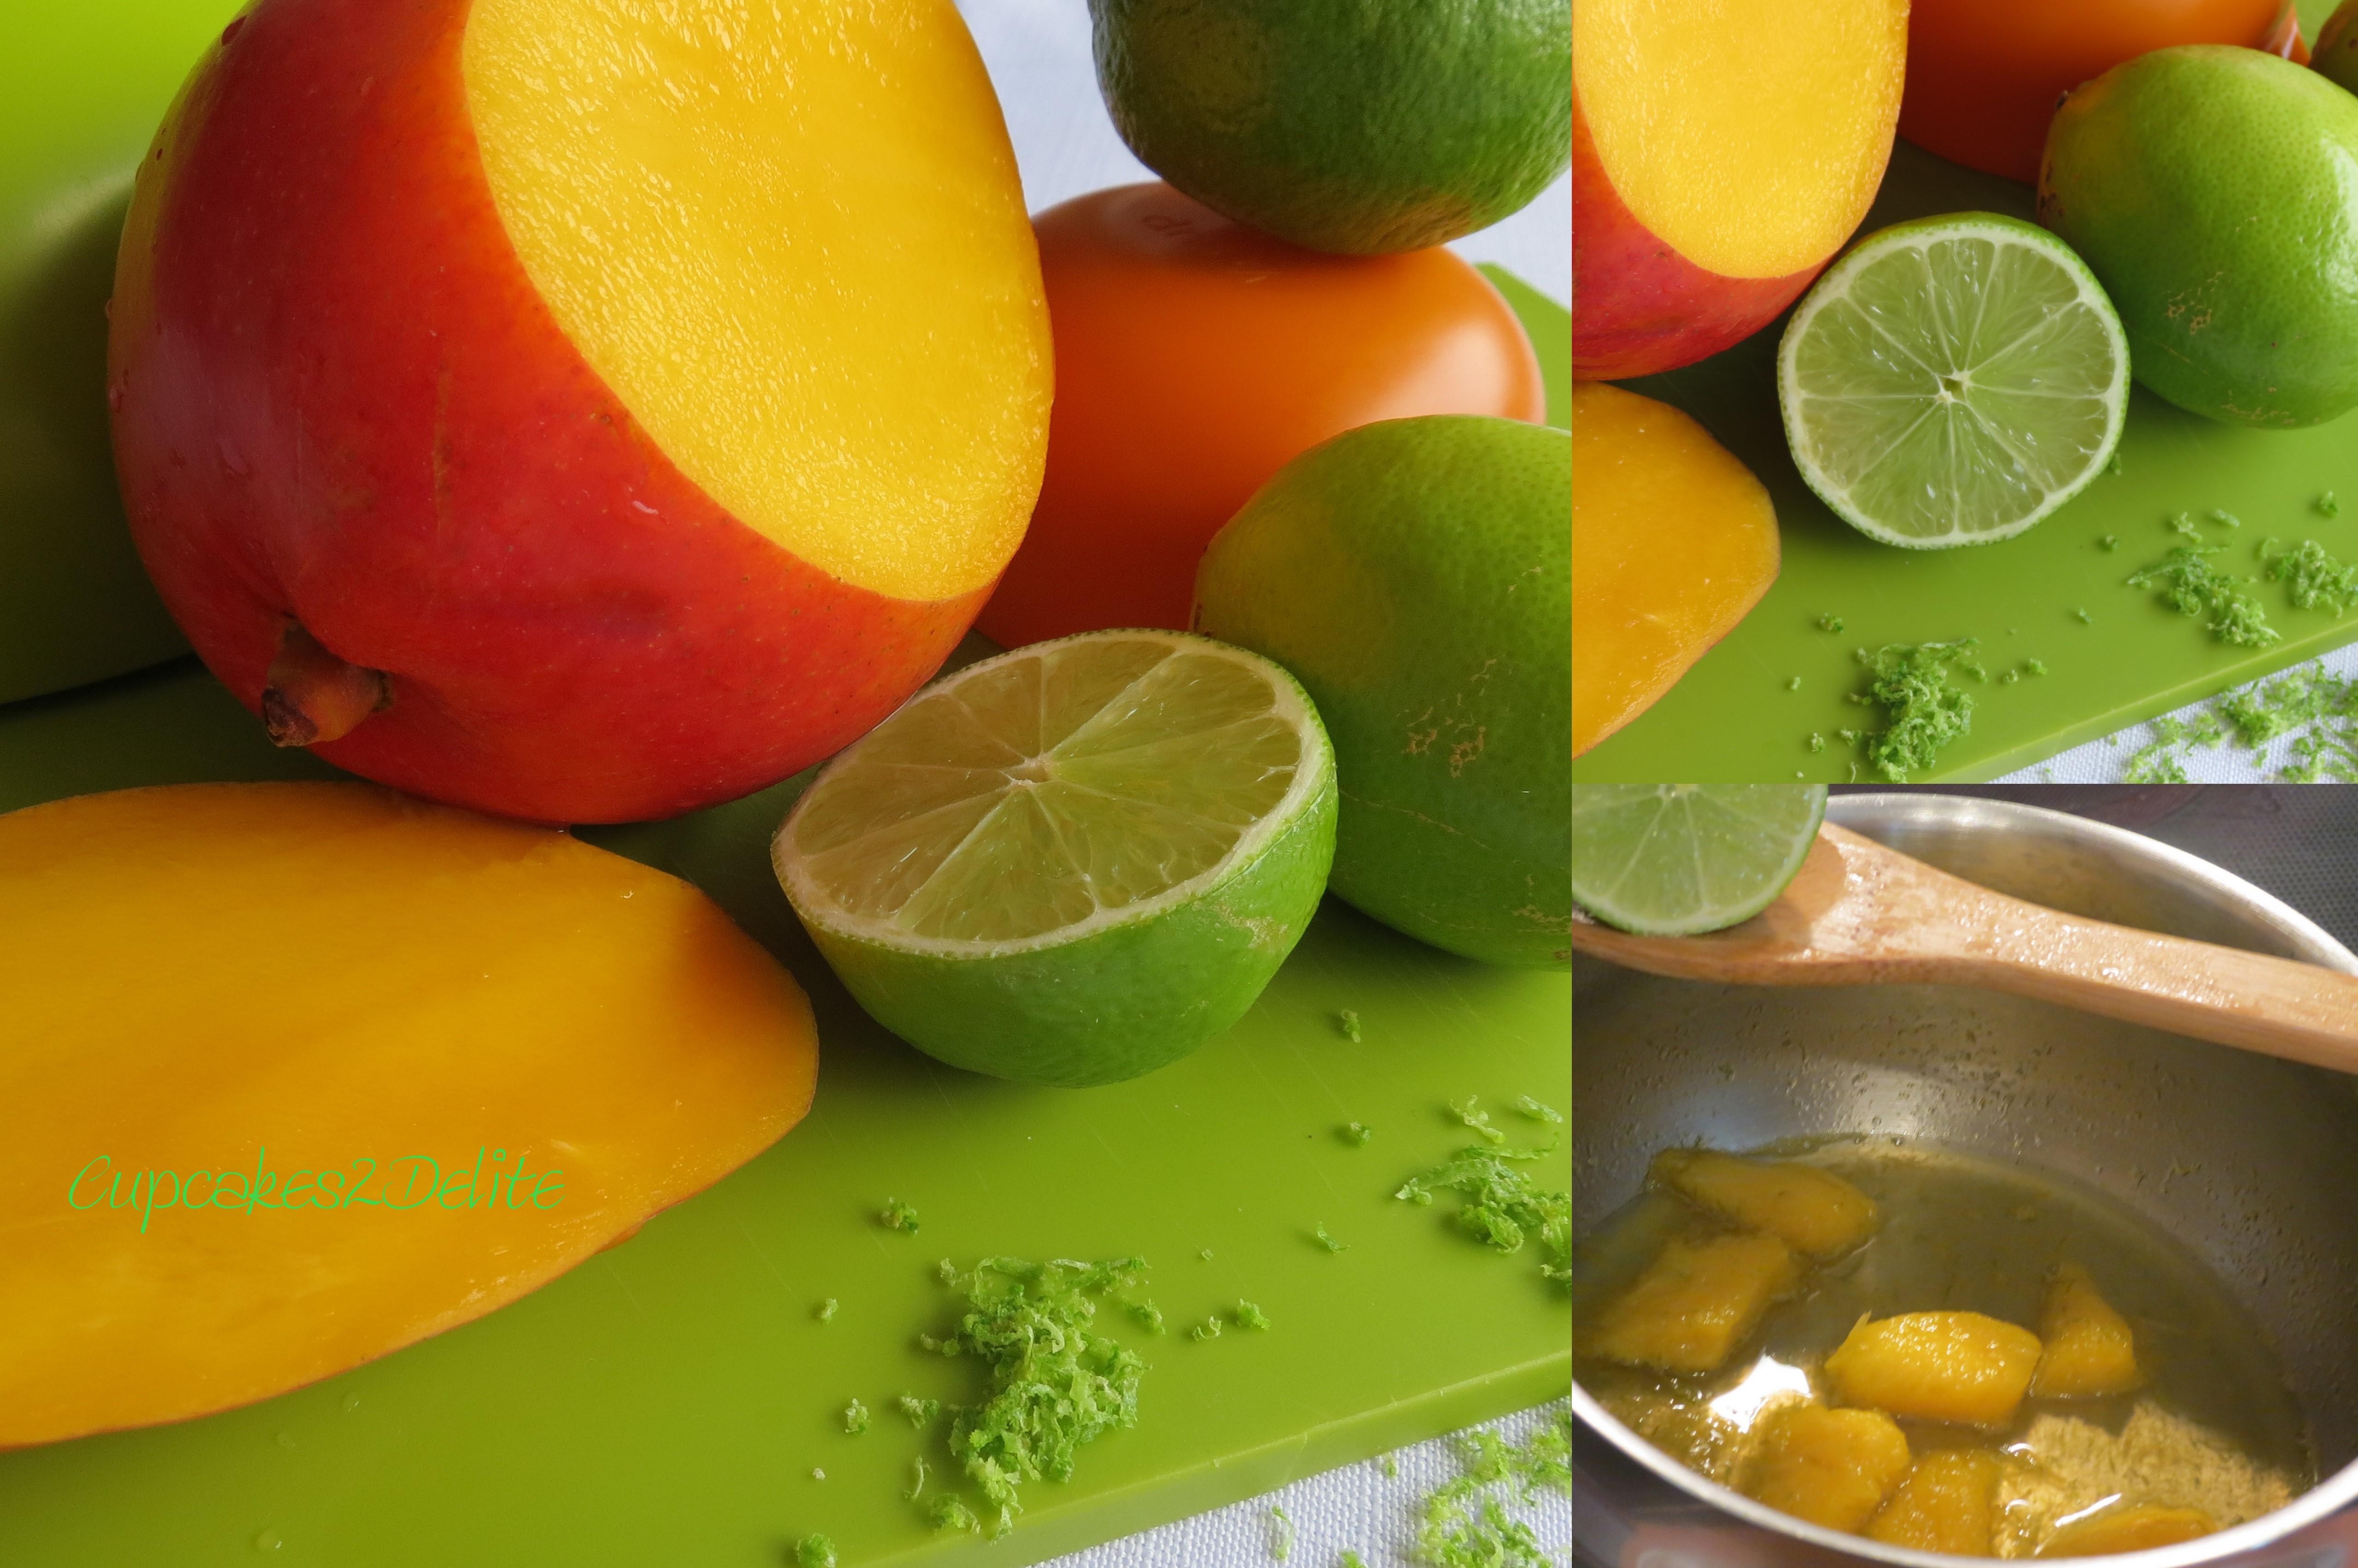 White Key Tag >> Key Lime and Mango Cupcakes | cupcakes2delite